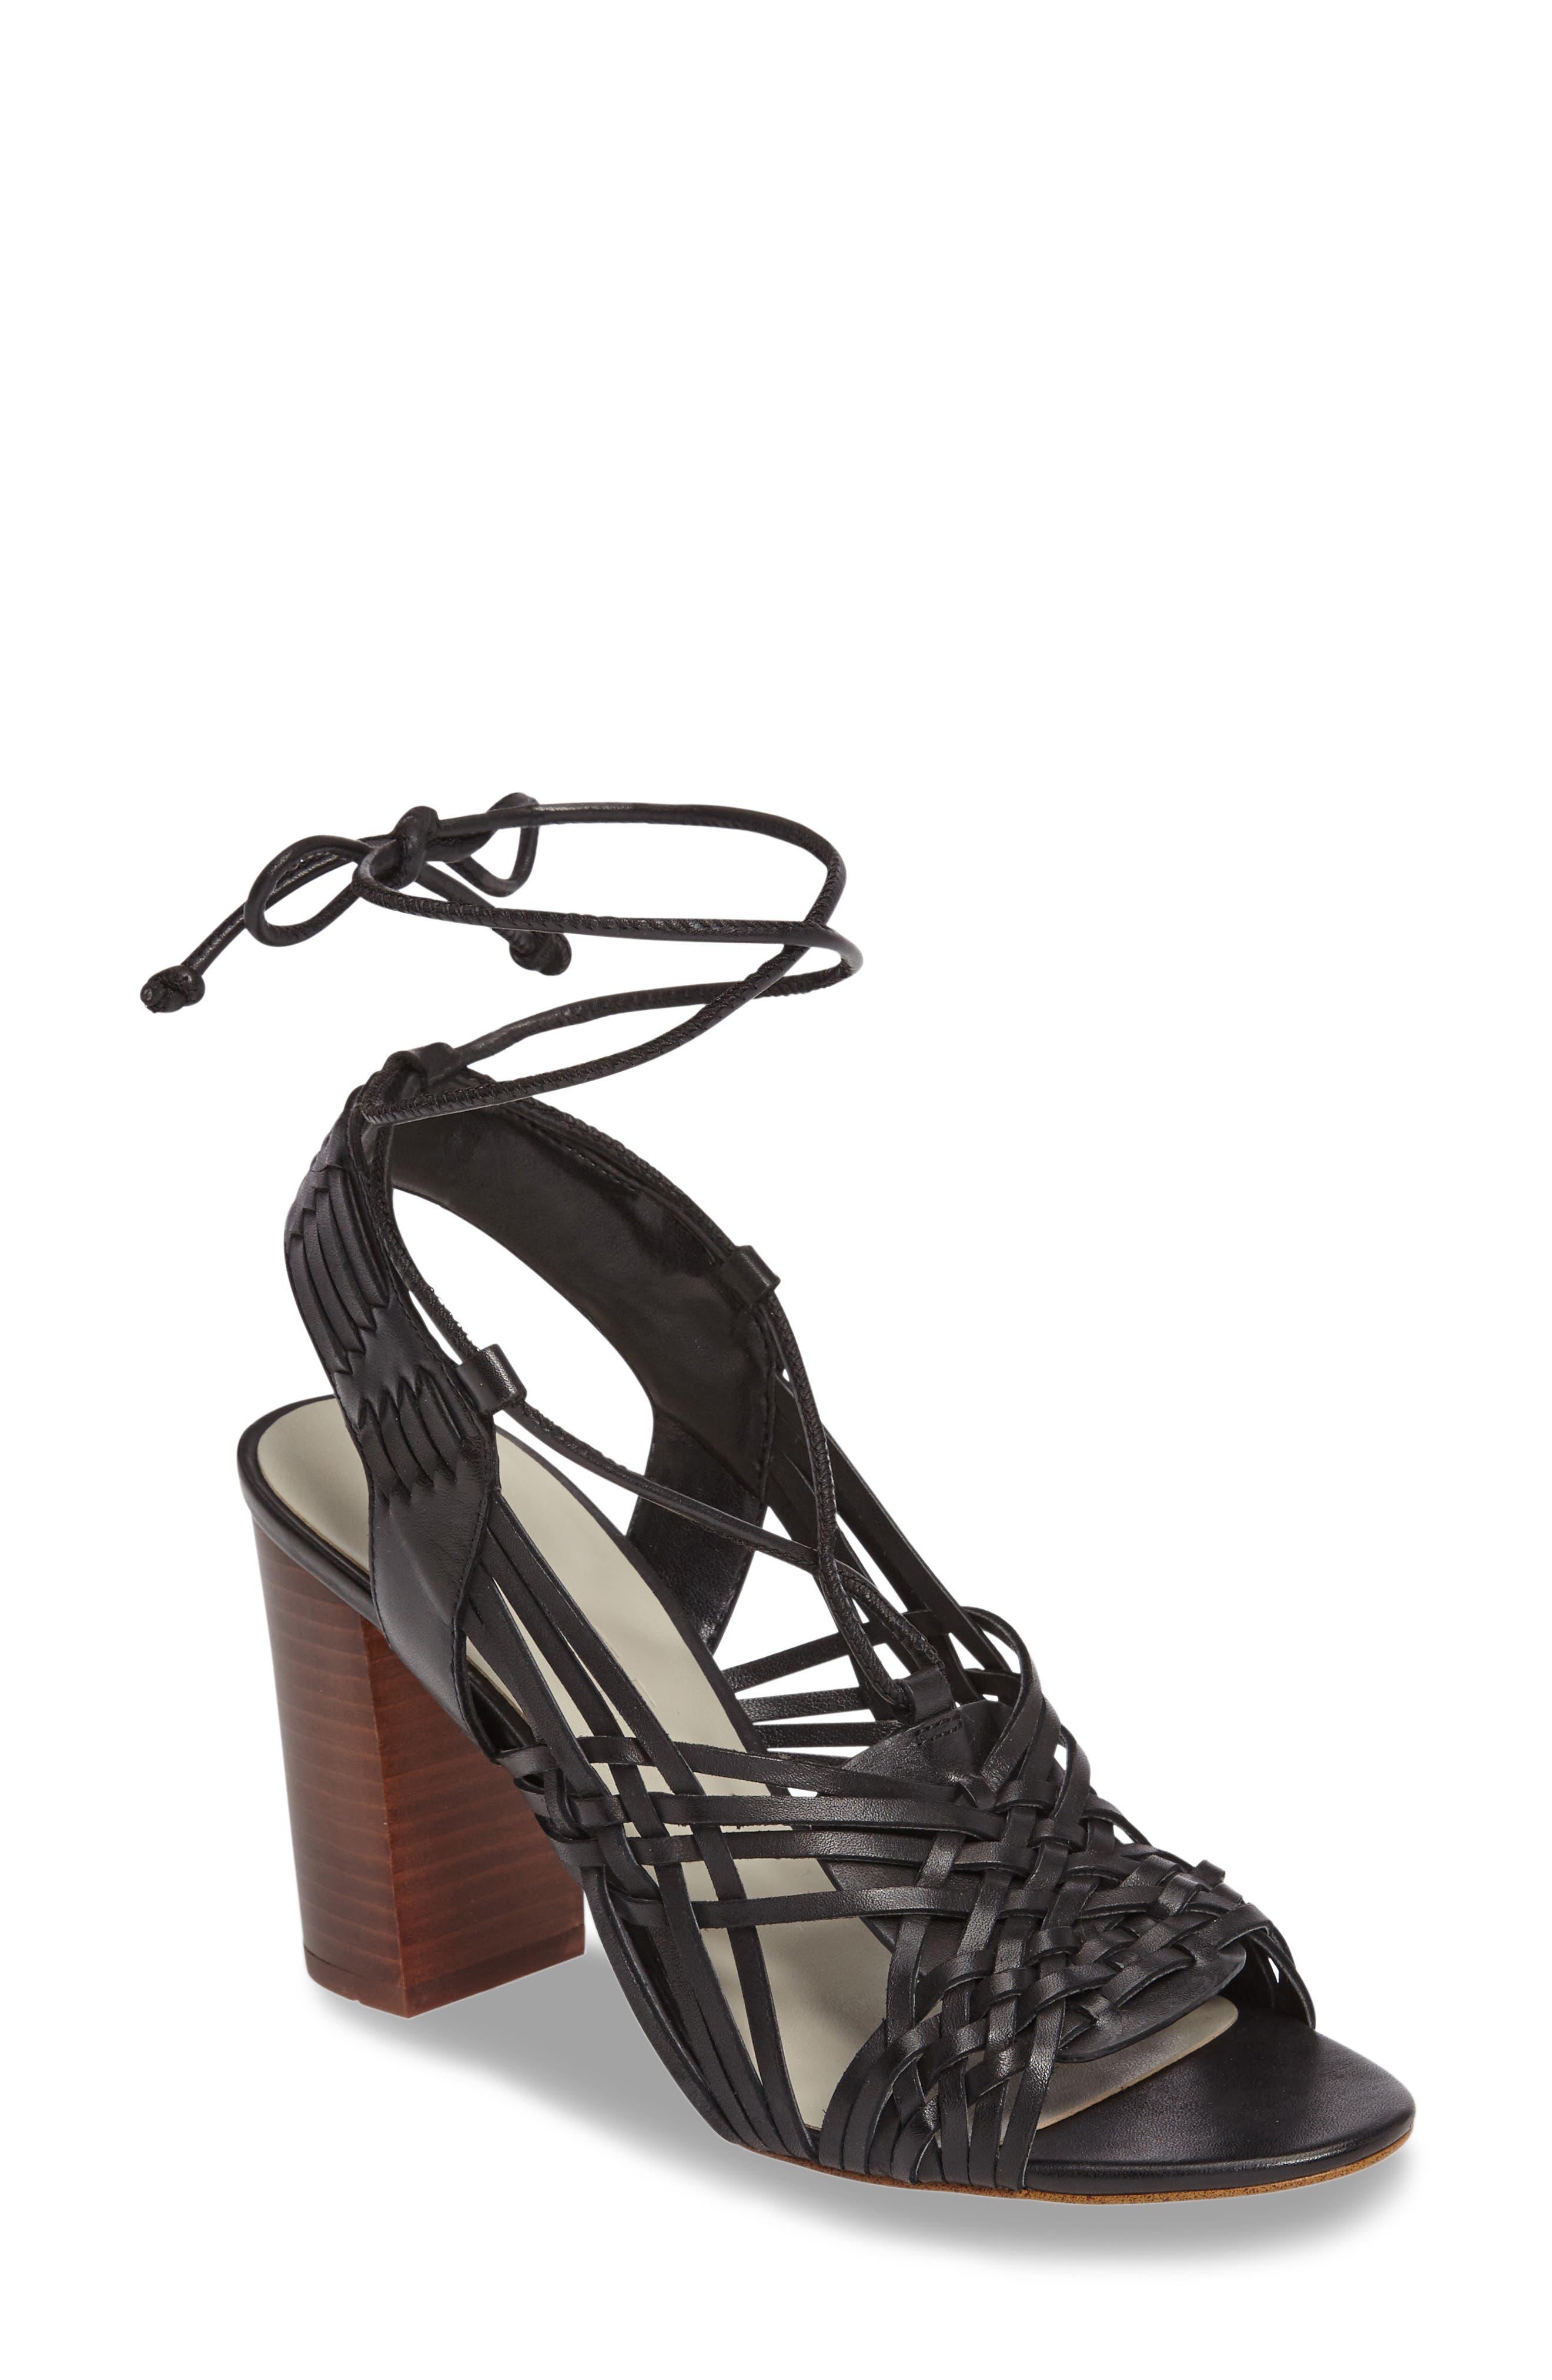 Shannen Block Heel Sandal,                             Main thumbnail 1, color,                             001